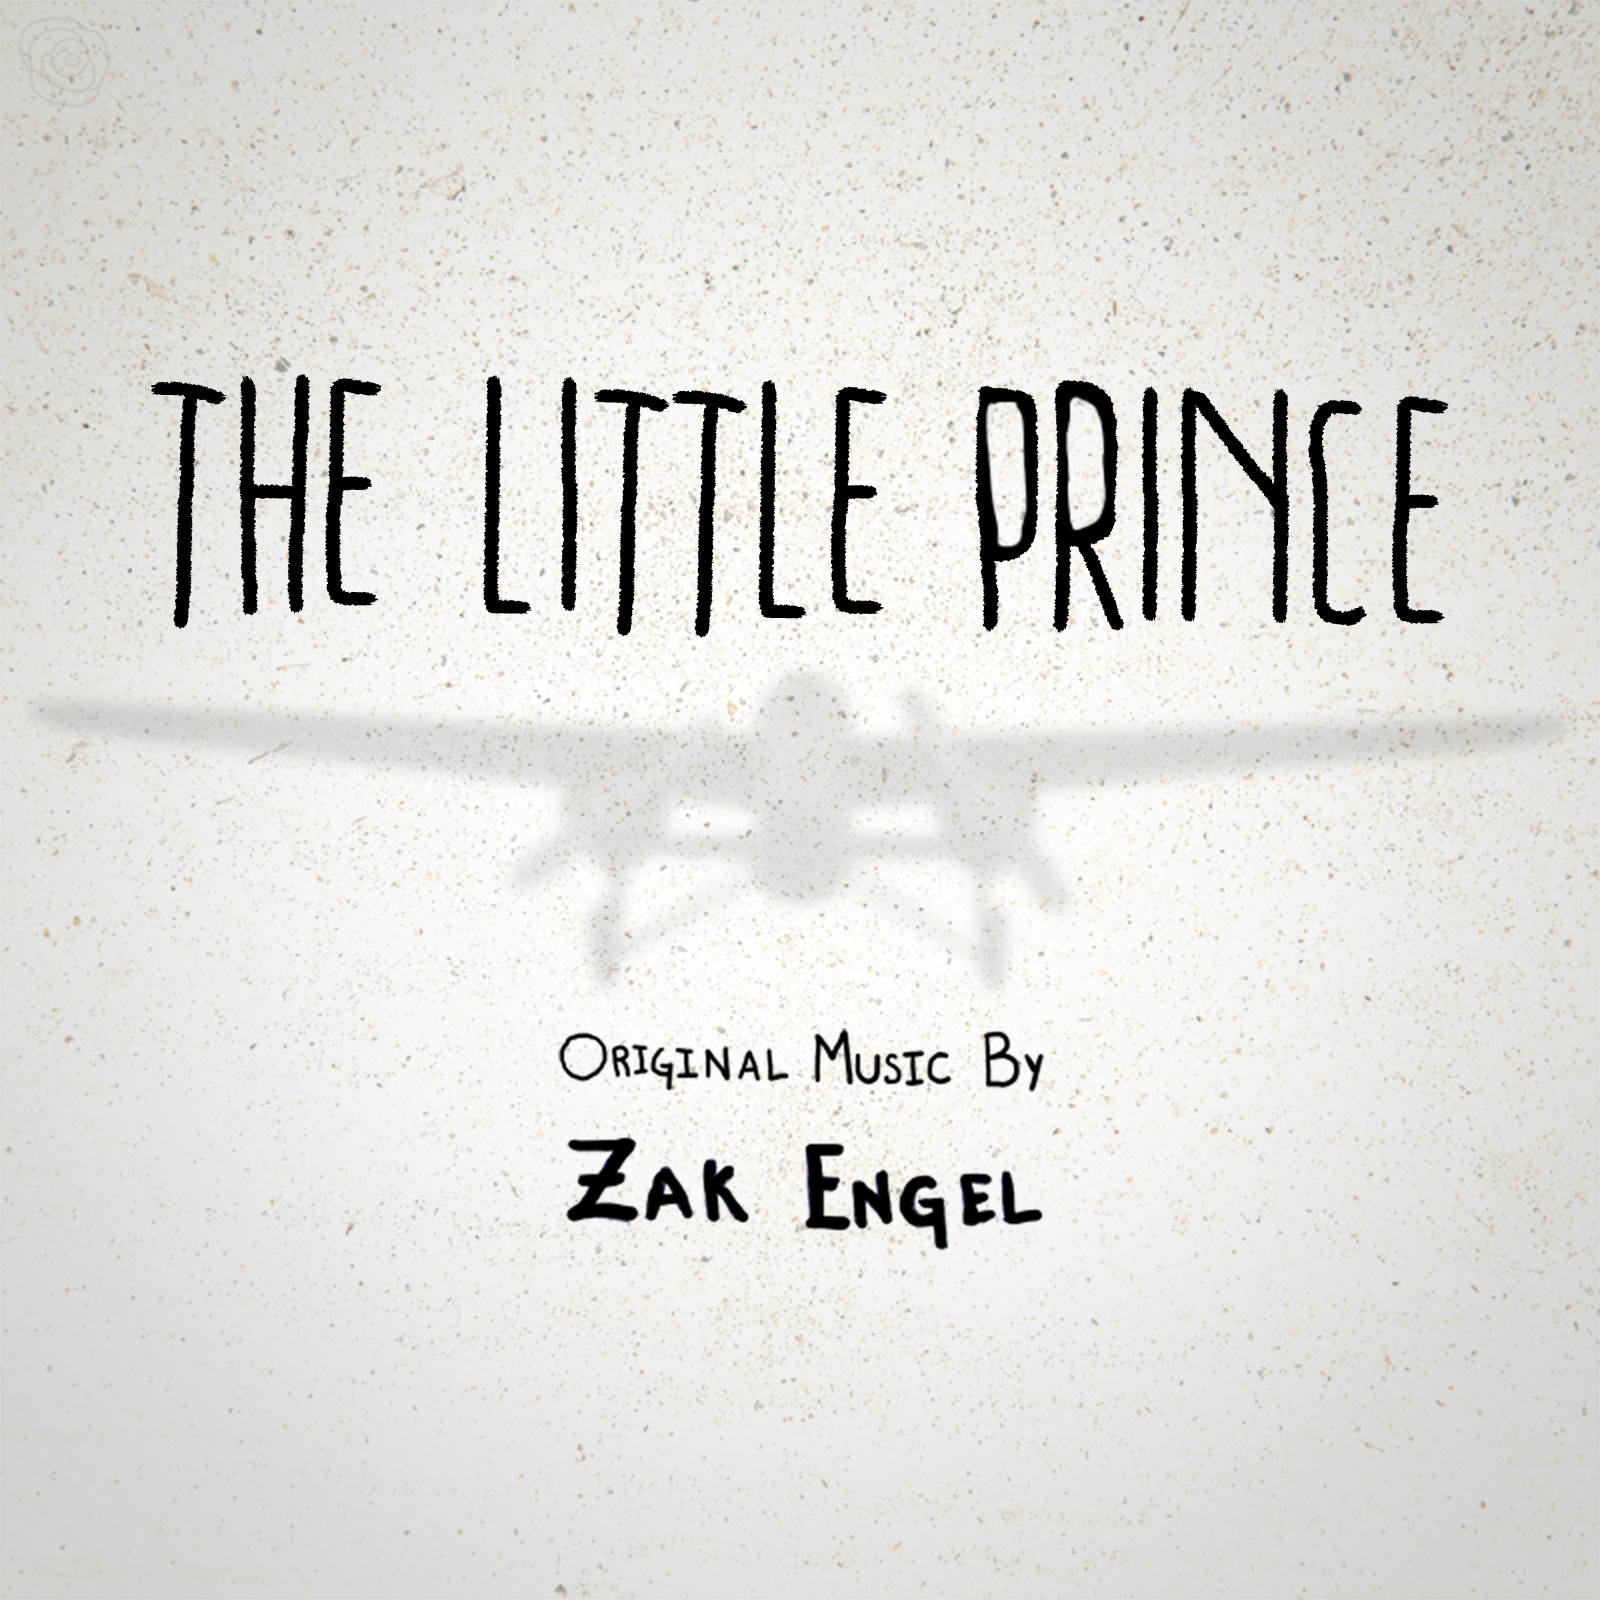 The Little Prince Album Art.jpg